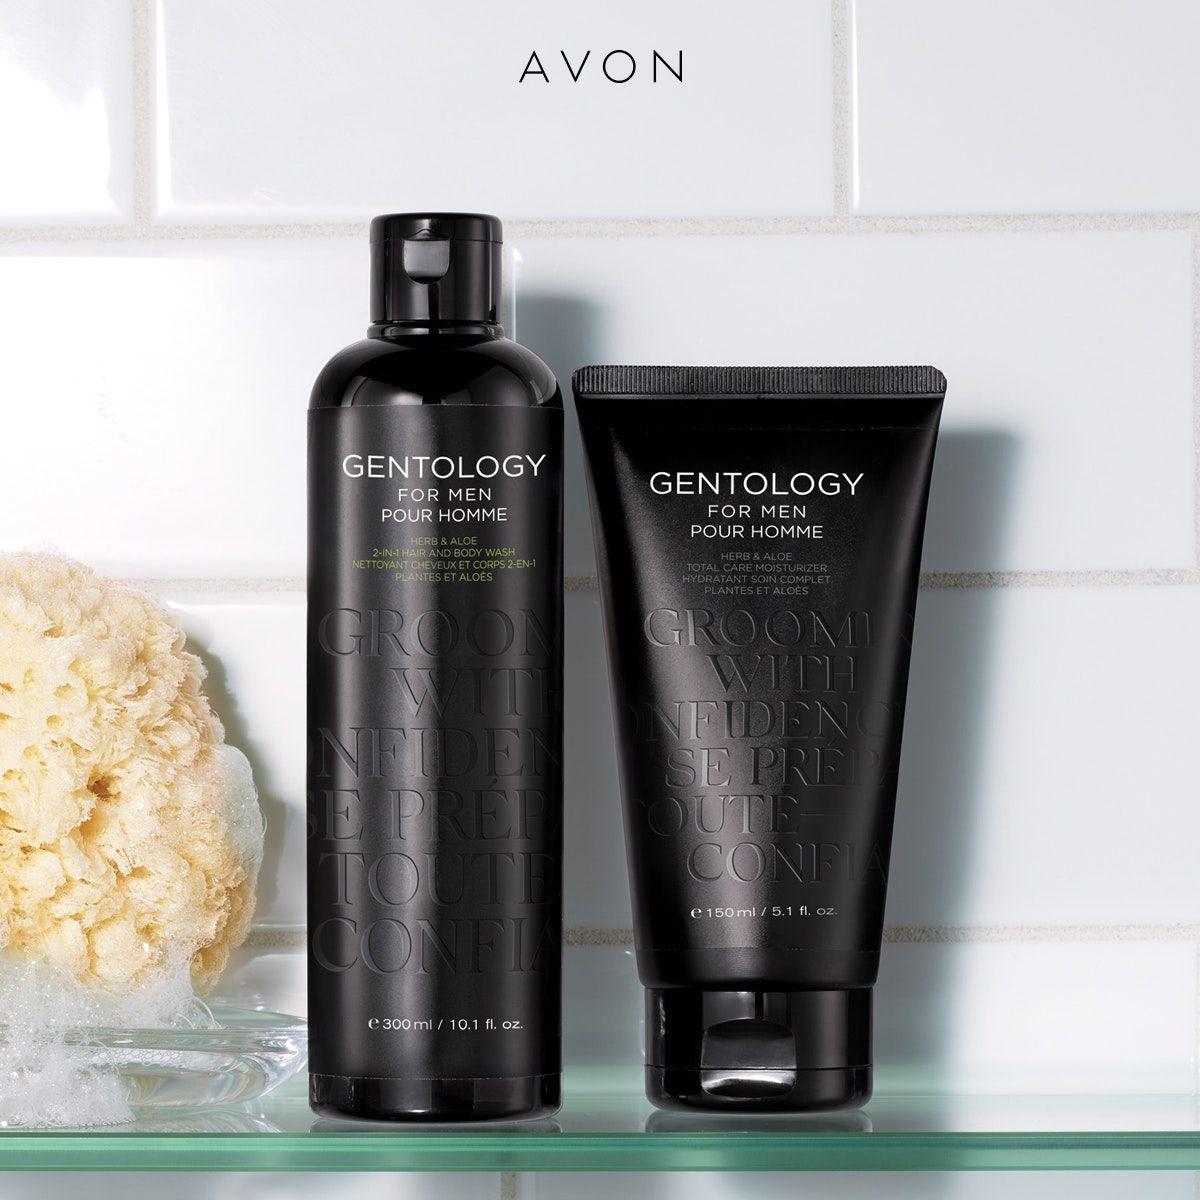 Gentology In 2020 Avon Avon Skin Care Avon Representative